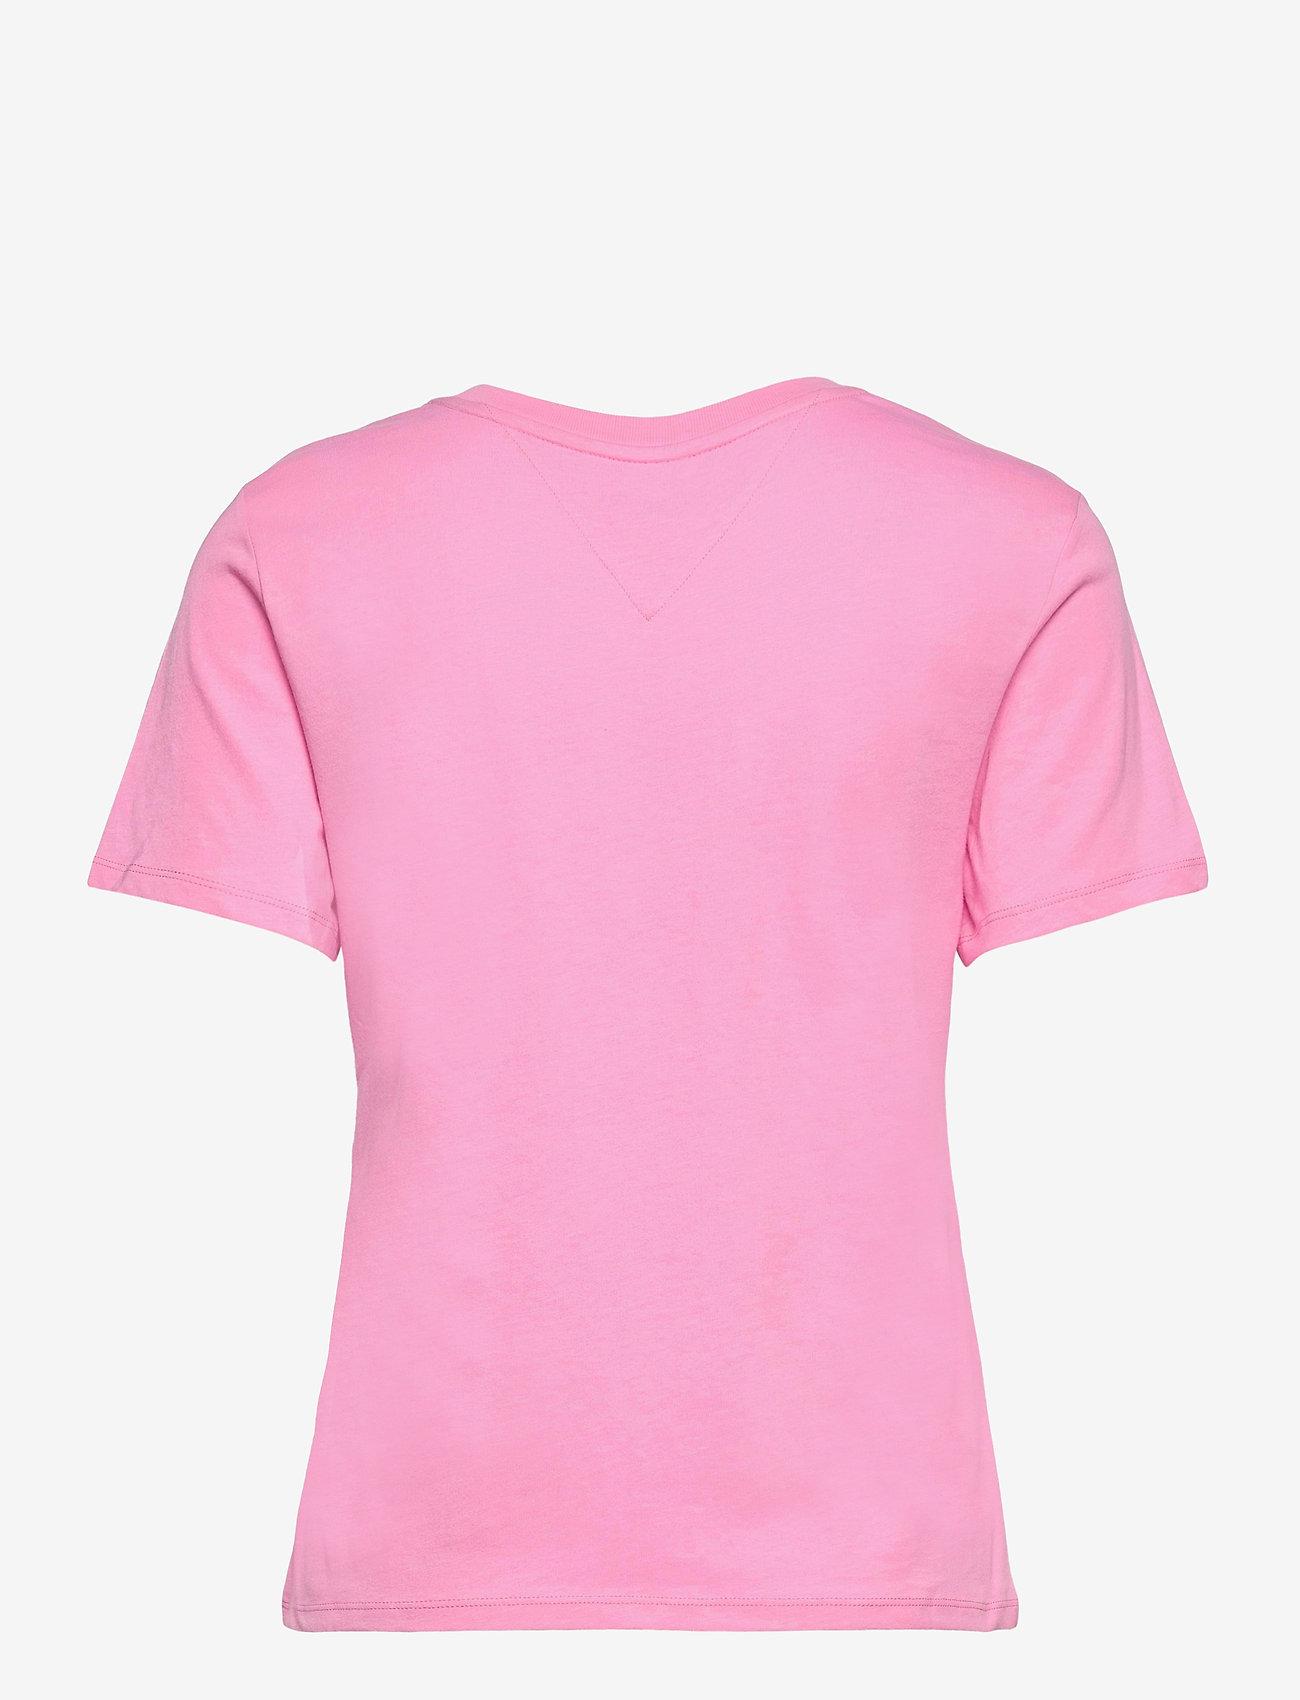 Tommy Jeans - TJW REGULAR JERSEY C NECK - t-shirts - pink daisy - 1